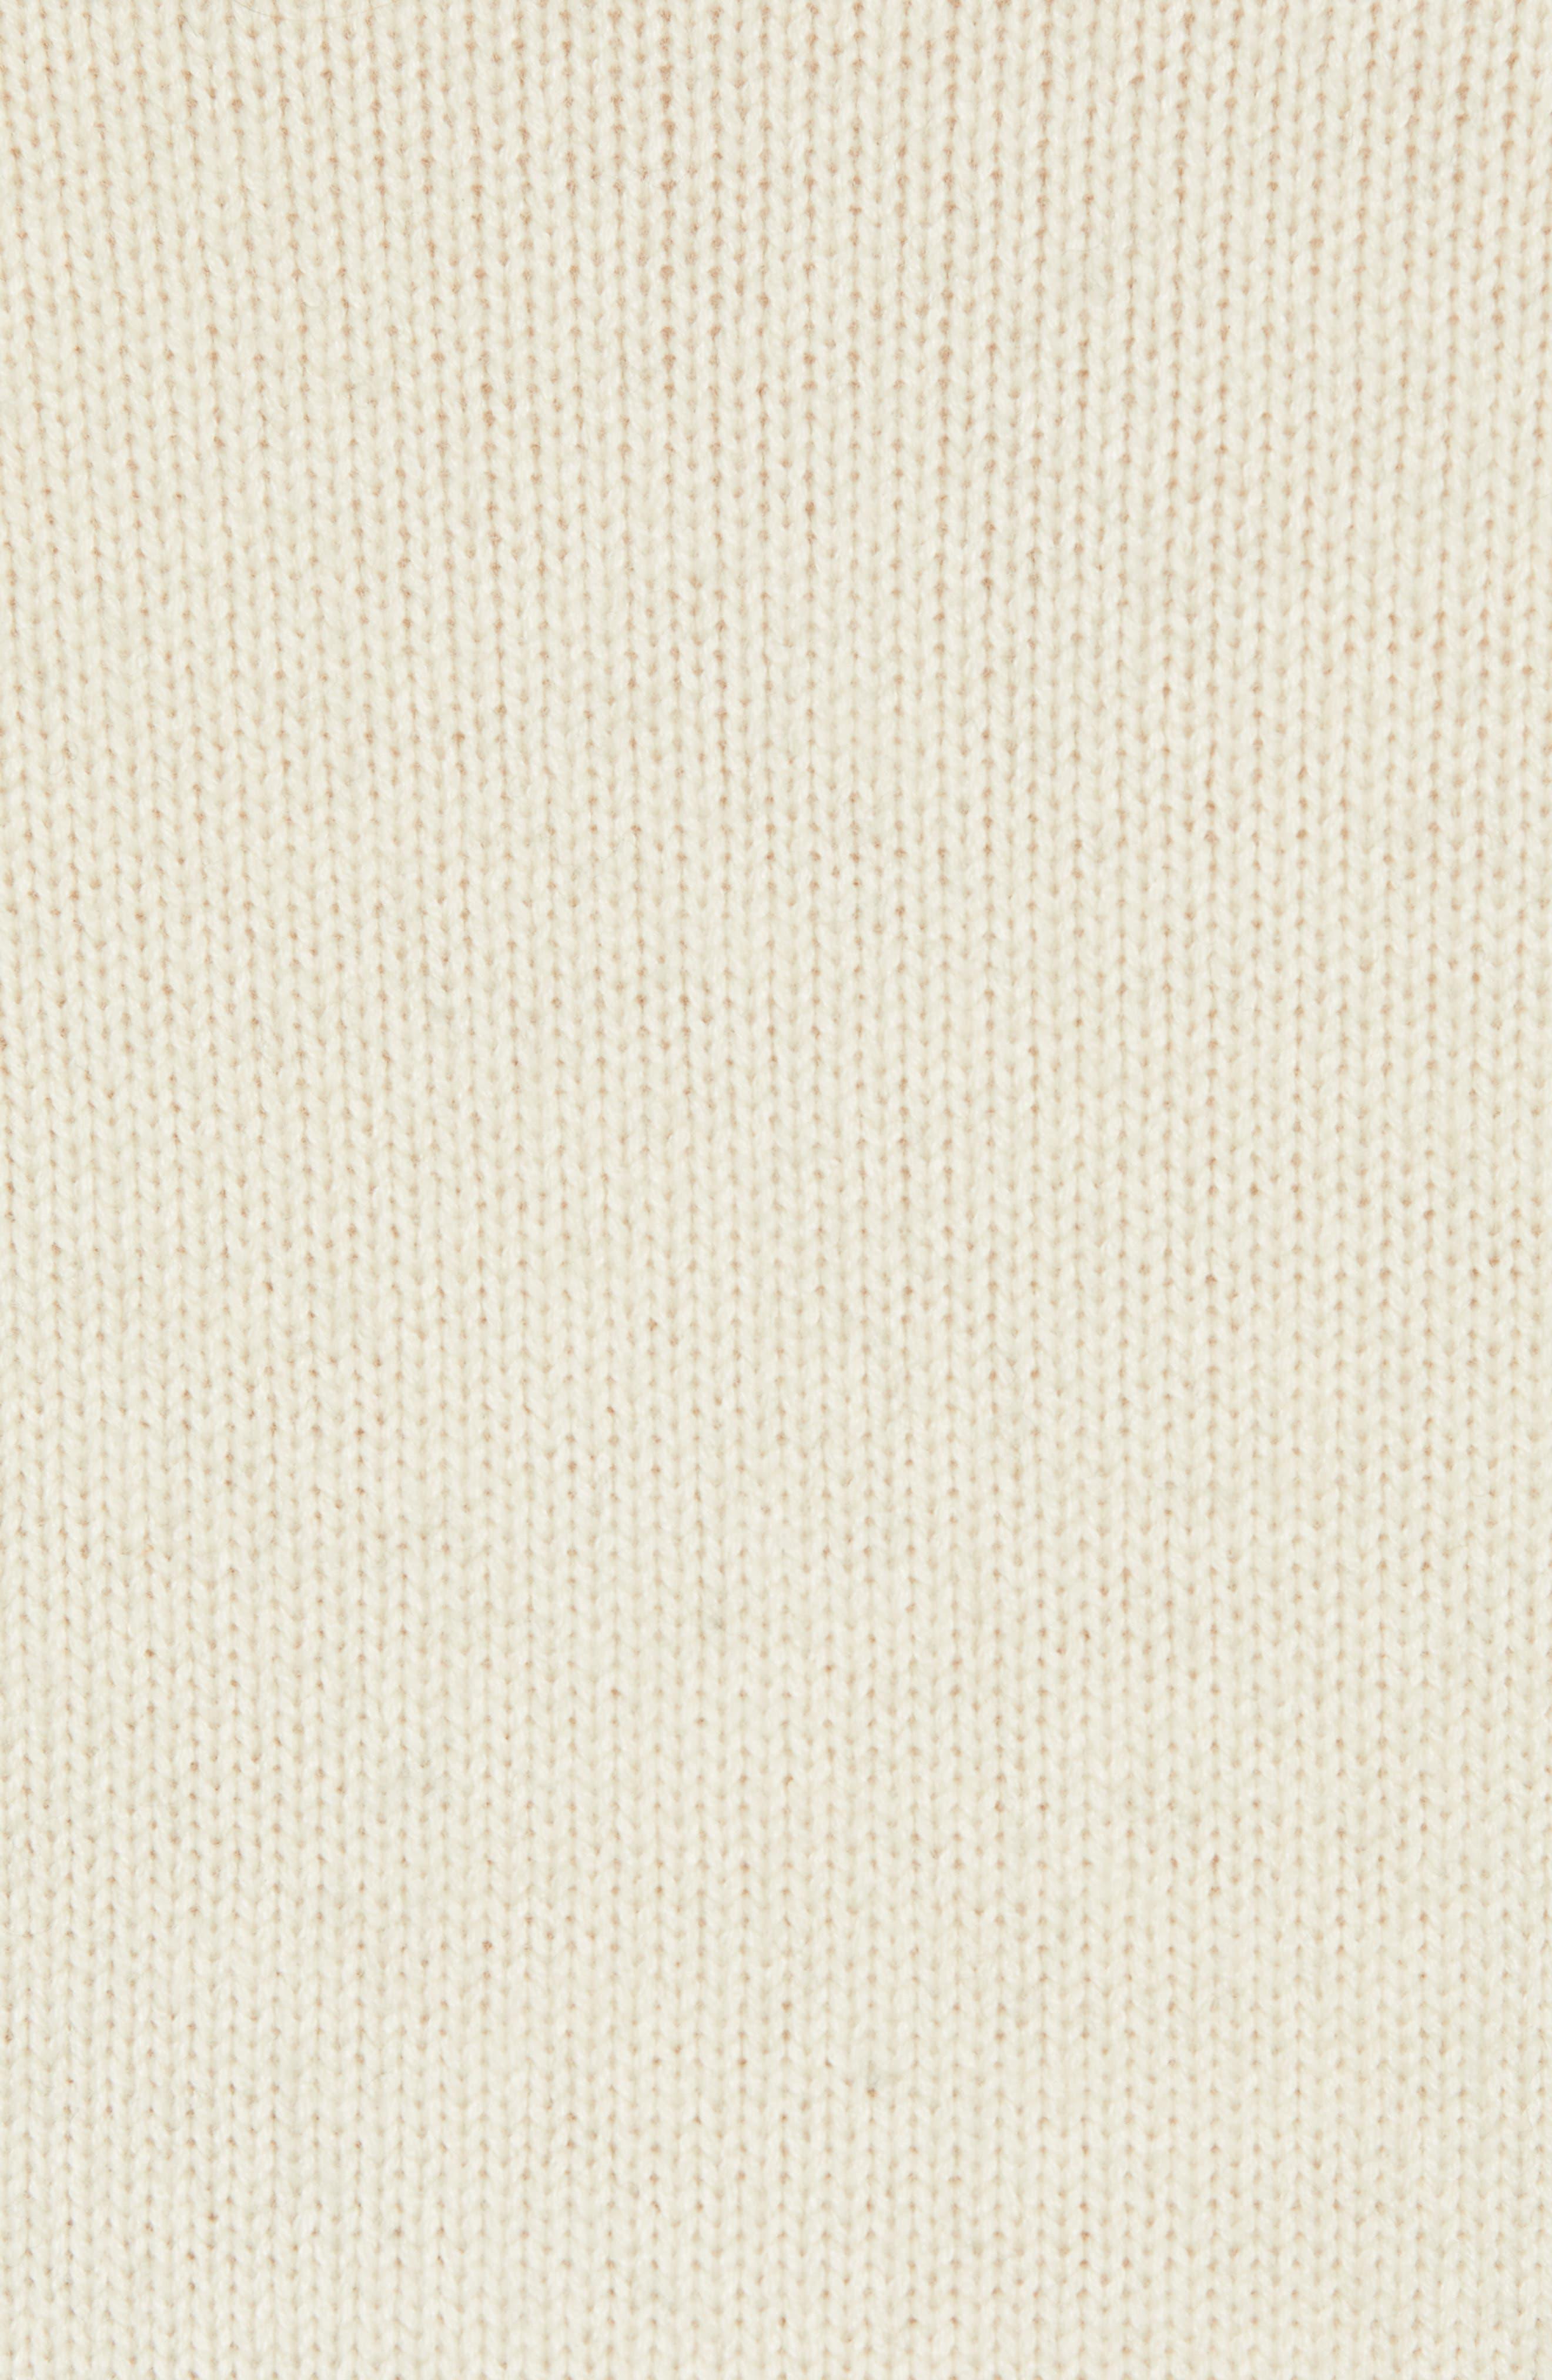 Colorblock Turtleneck Sweater,                             Alternate thumbnail 5, color,                             FOG MID GREY MELANGE